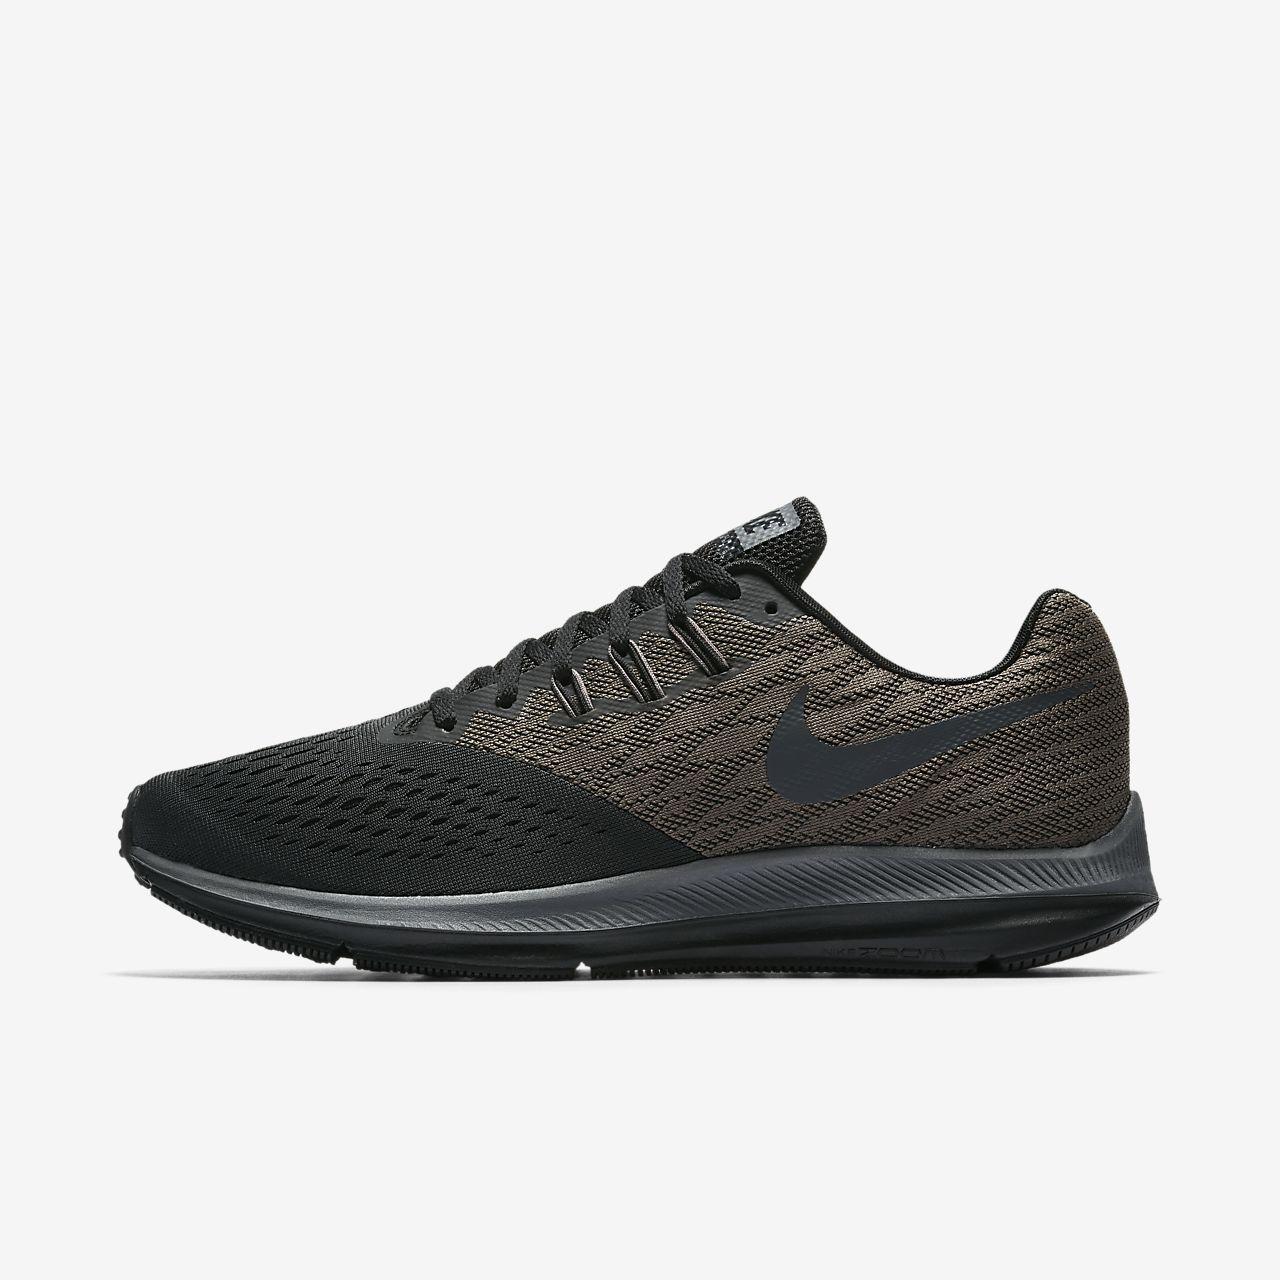 d14381a0014e Nike Zoom Winflo 4 Men s Running Shoe. Nike.com AT